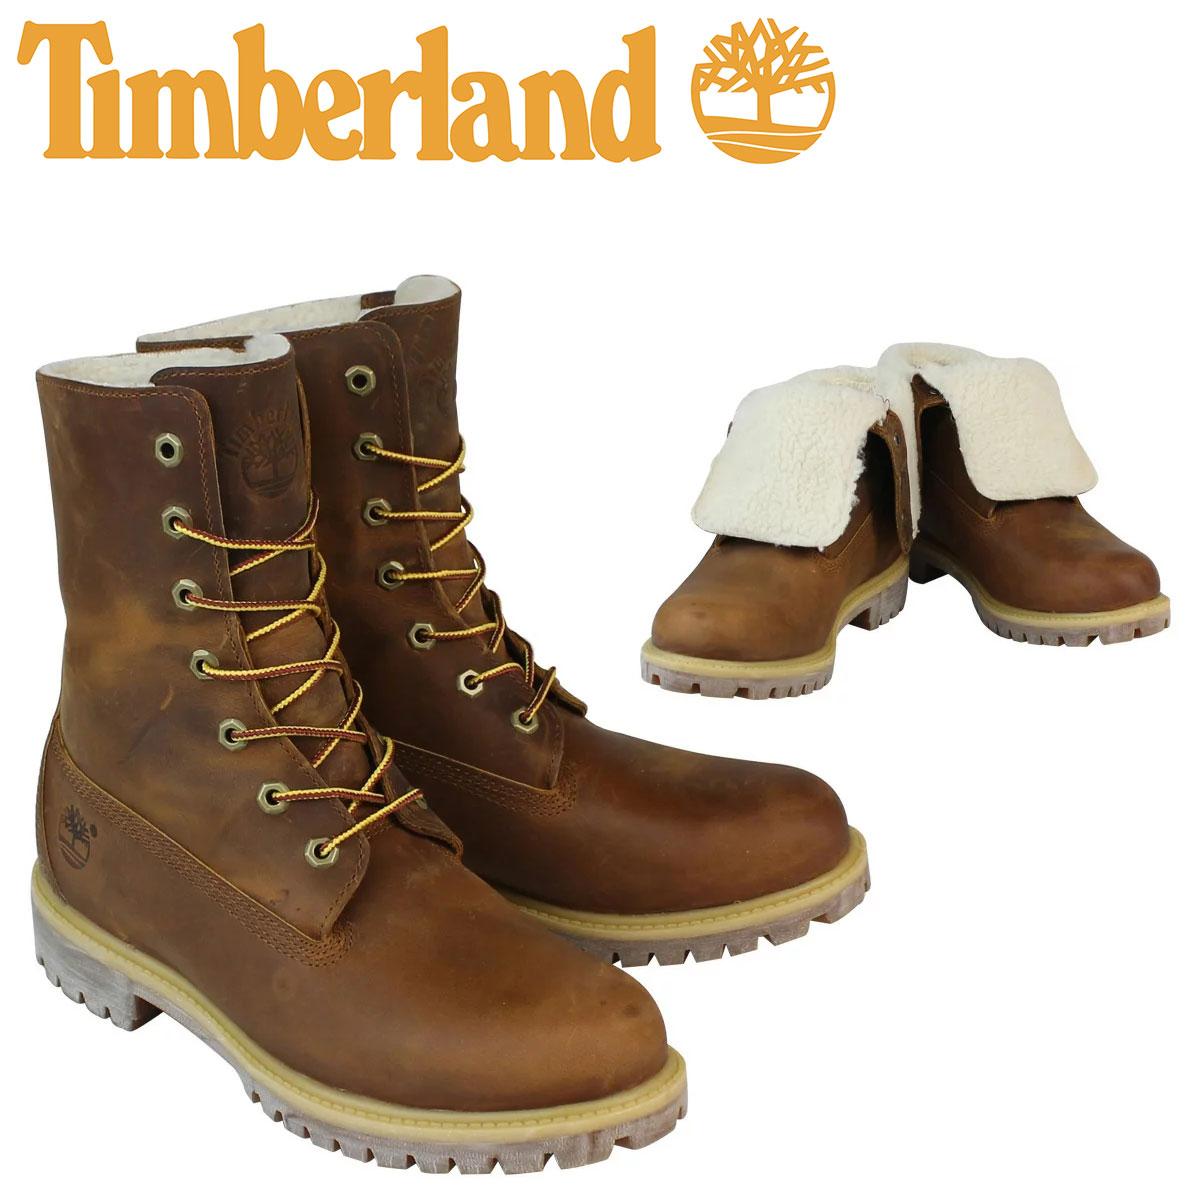 dc54c4d7bae Timberland Timberland HERITAGE FOLD-DOWN WARM FLEECE LINED BOOT  ブーツヘリテージフォルドダウンフリースライン A118Y brown men